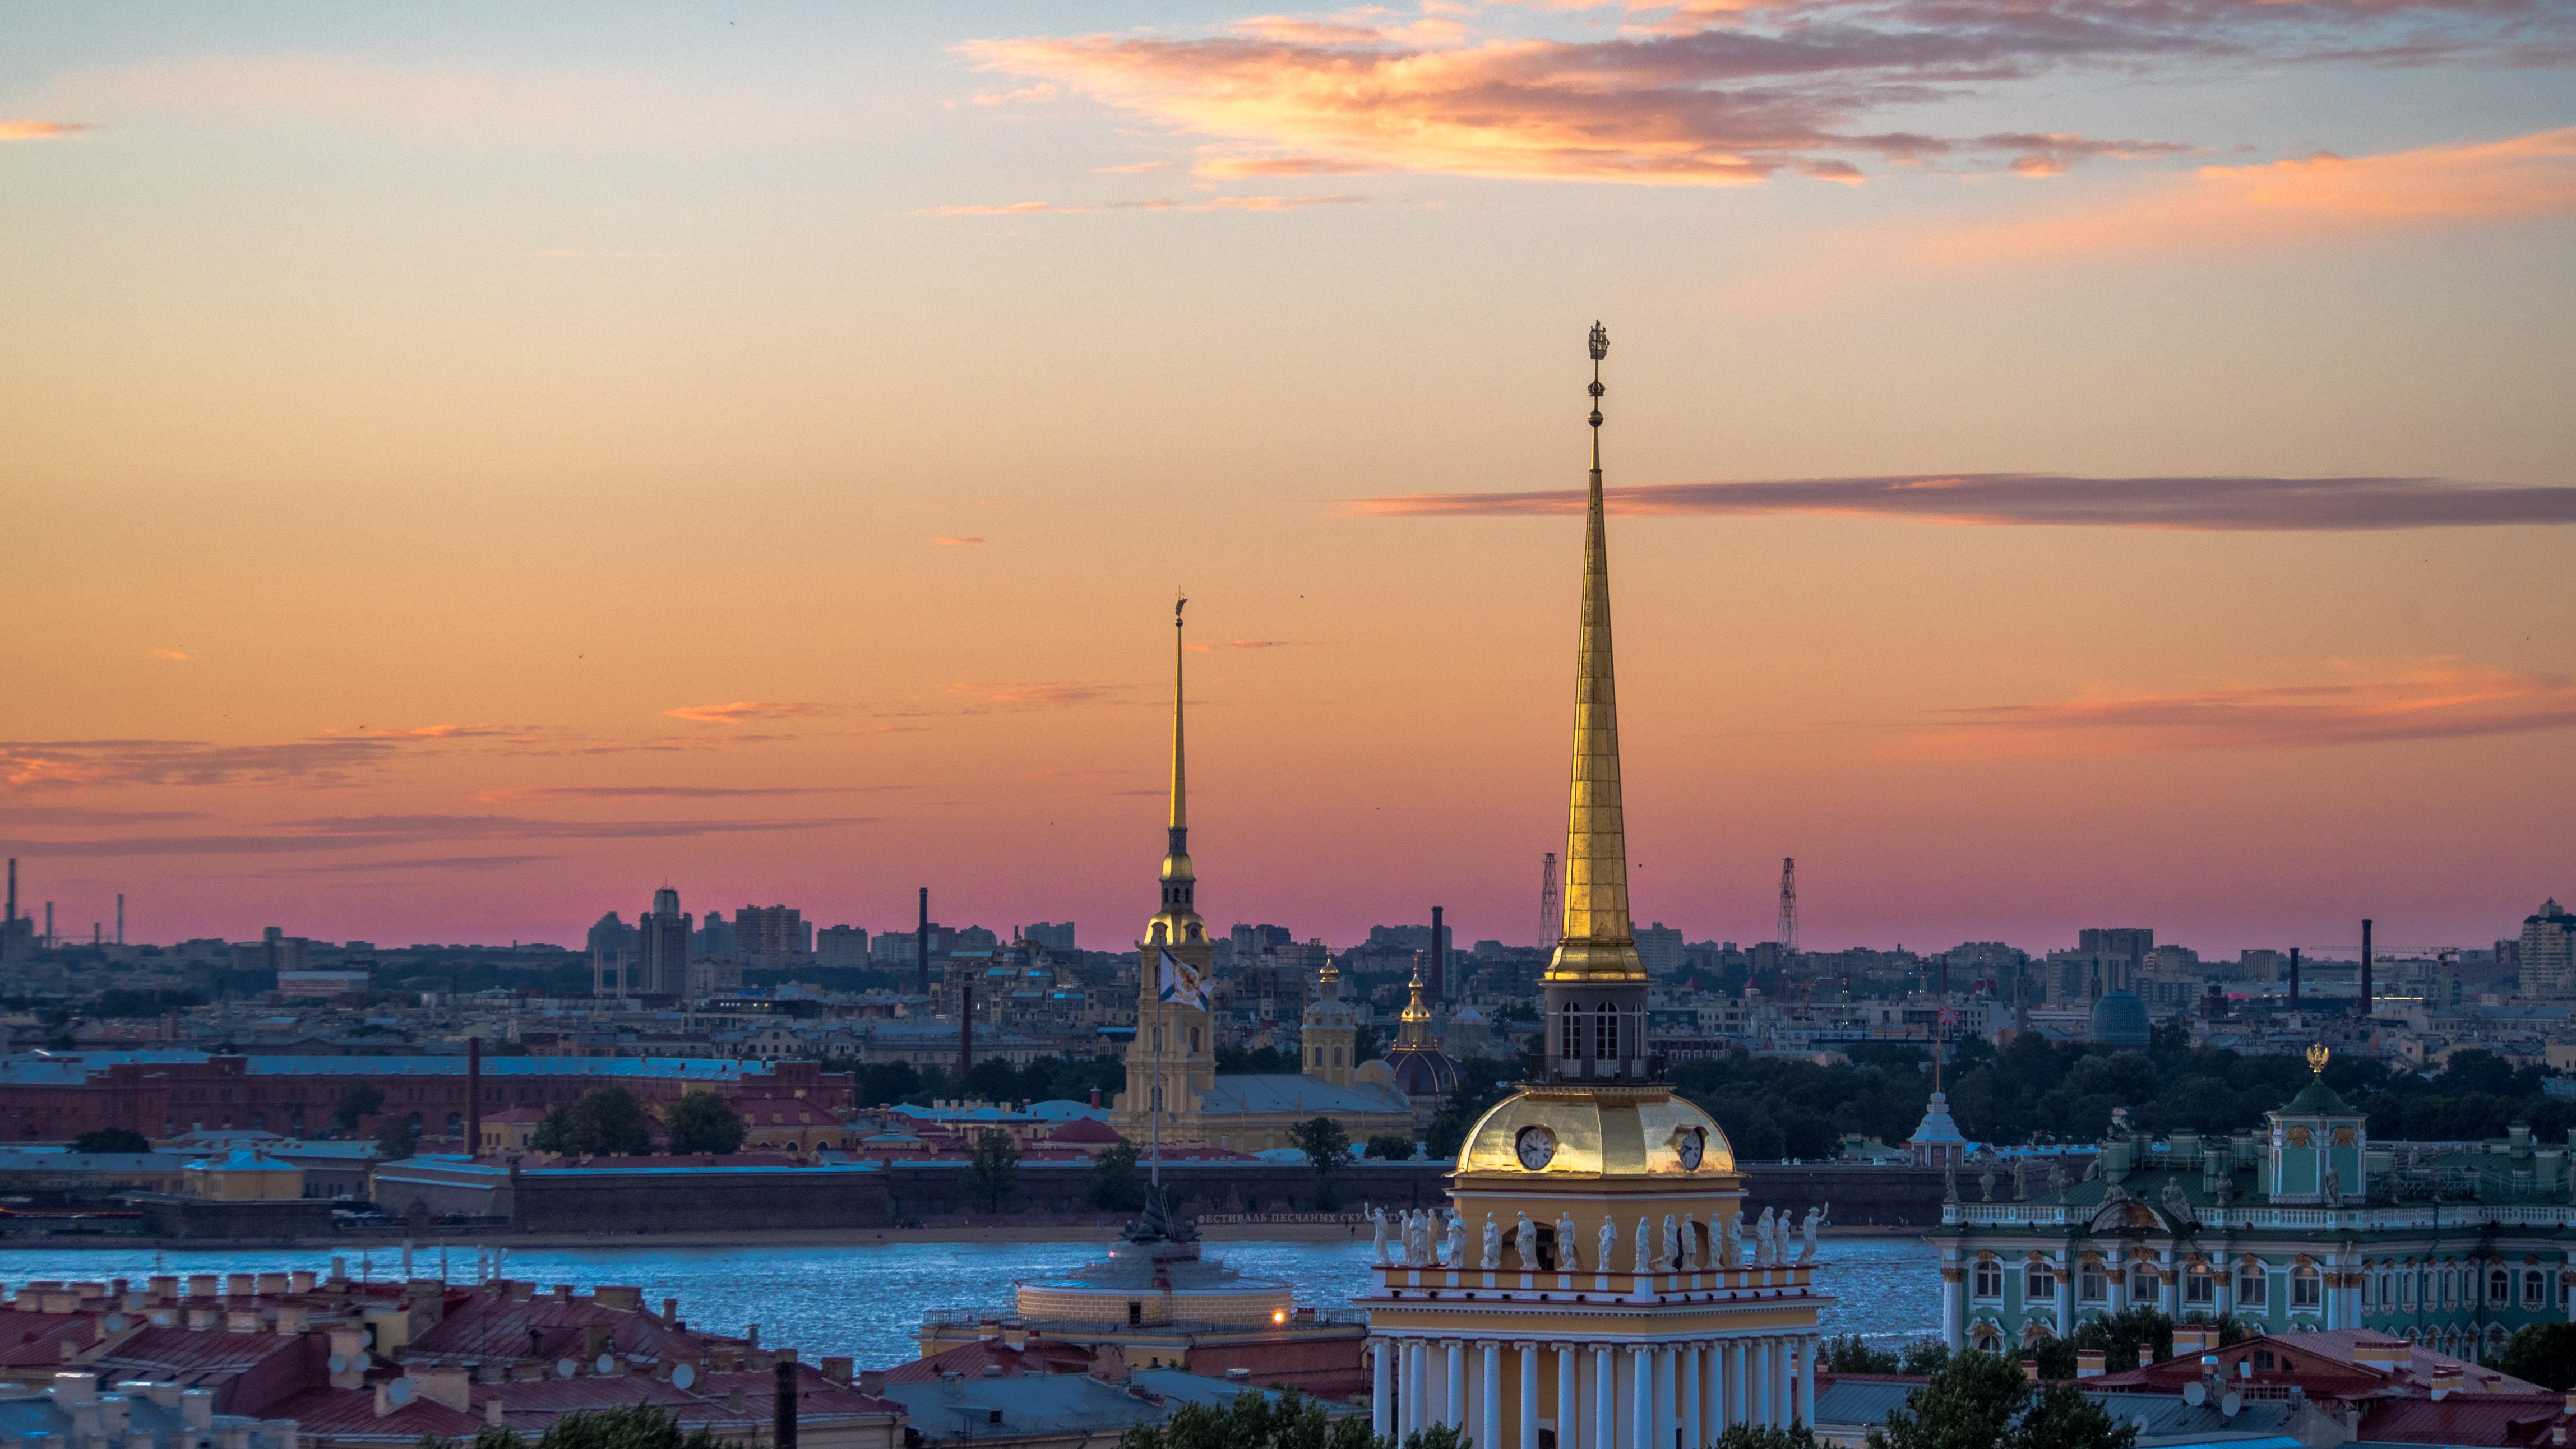 Architecture River Russia Saint Petersburg Sky Sunset 4595x2585